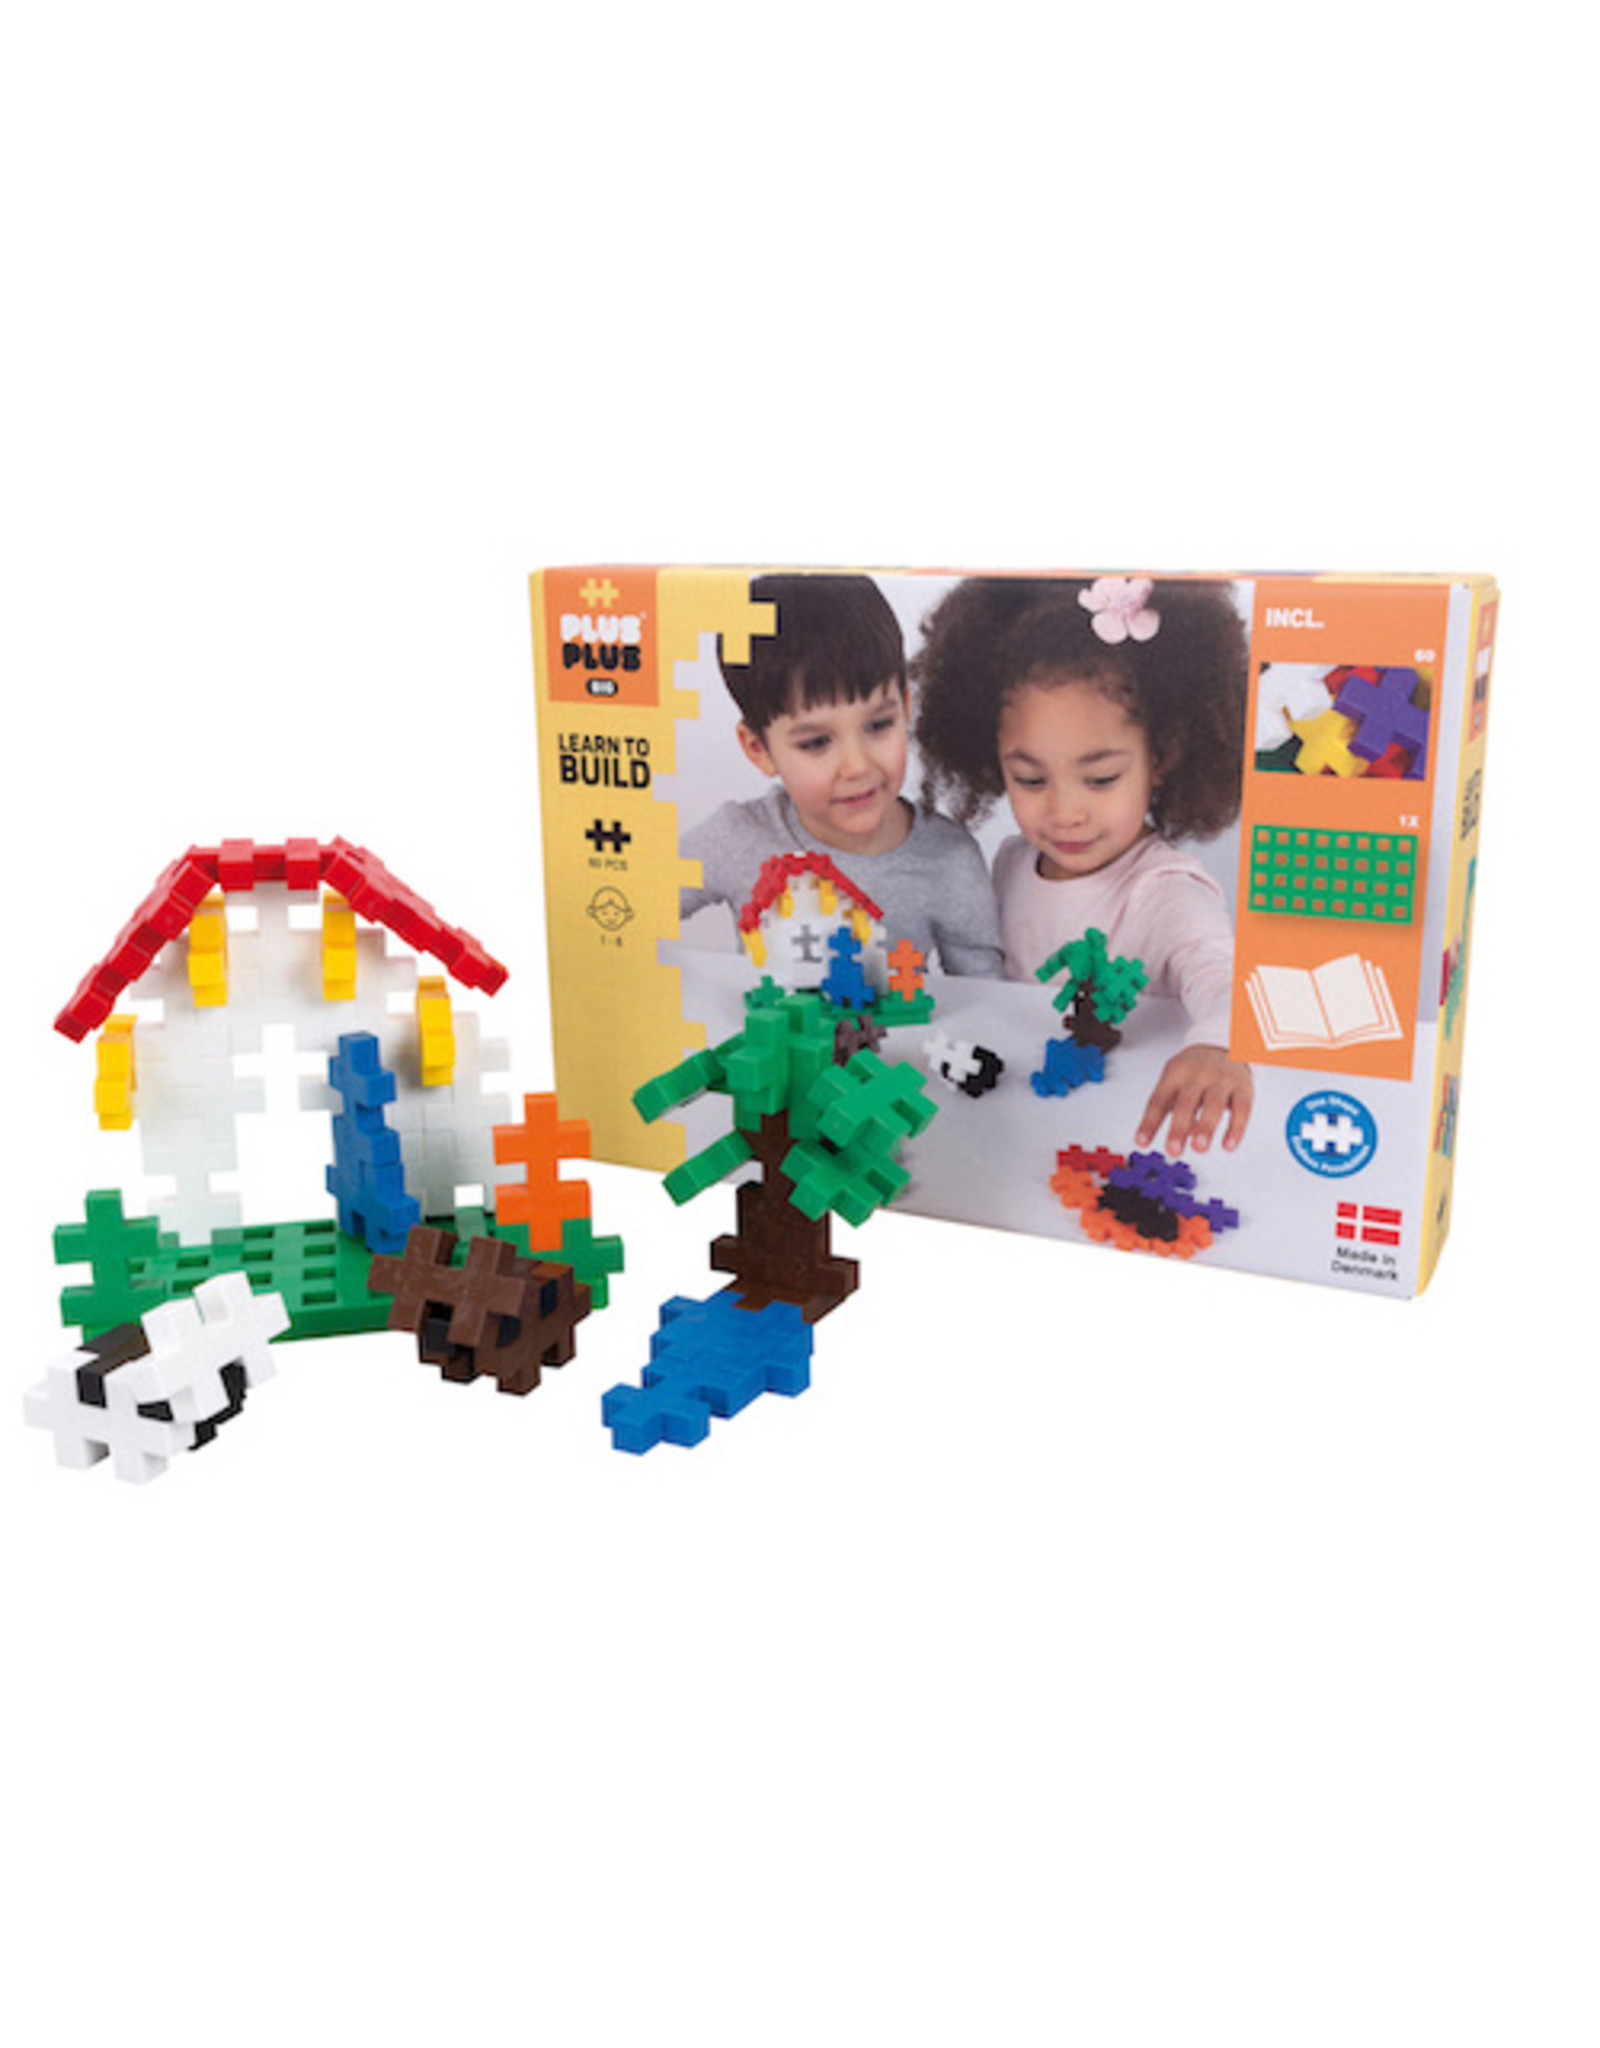 Plus-Plus Big! Learn to Build